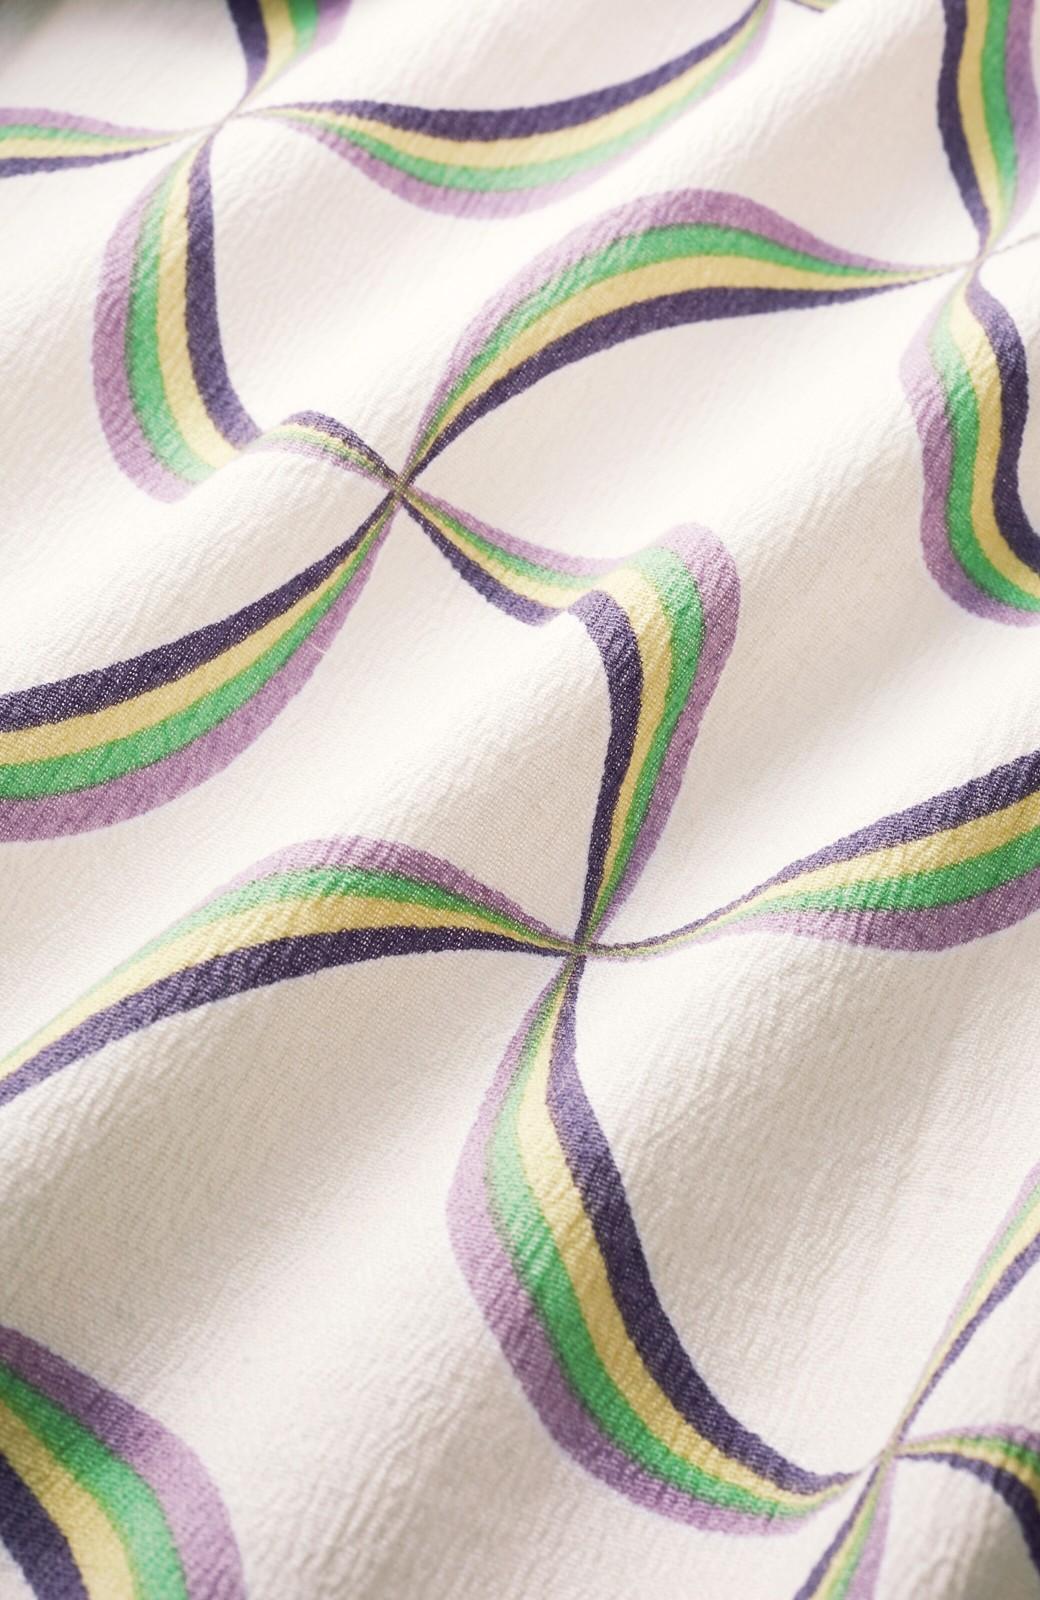 haco! ひでや工房 京都の綿ちりめん浴衣 <ホワイト系その他>の商品写真3